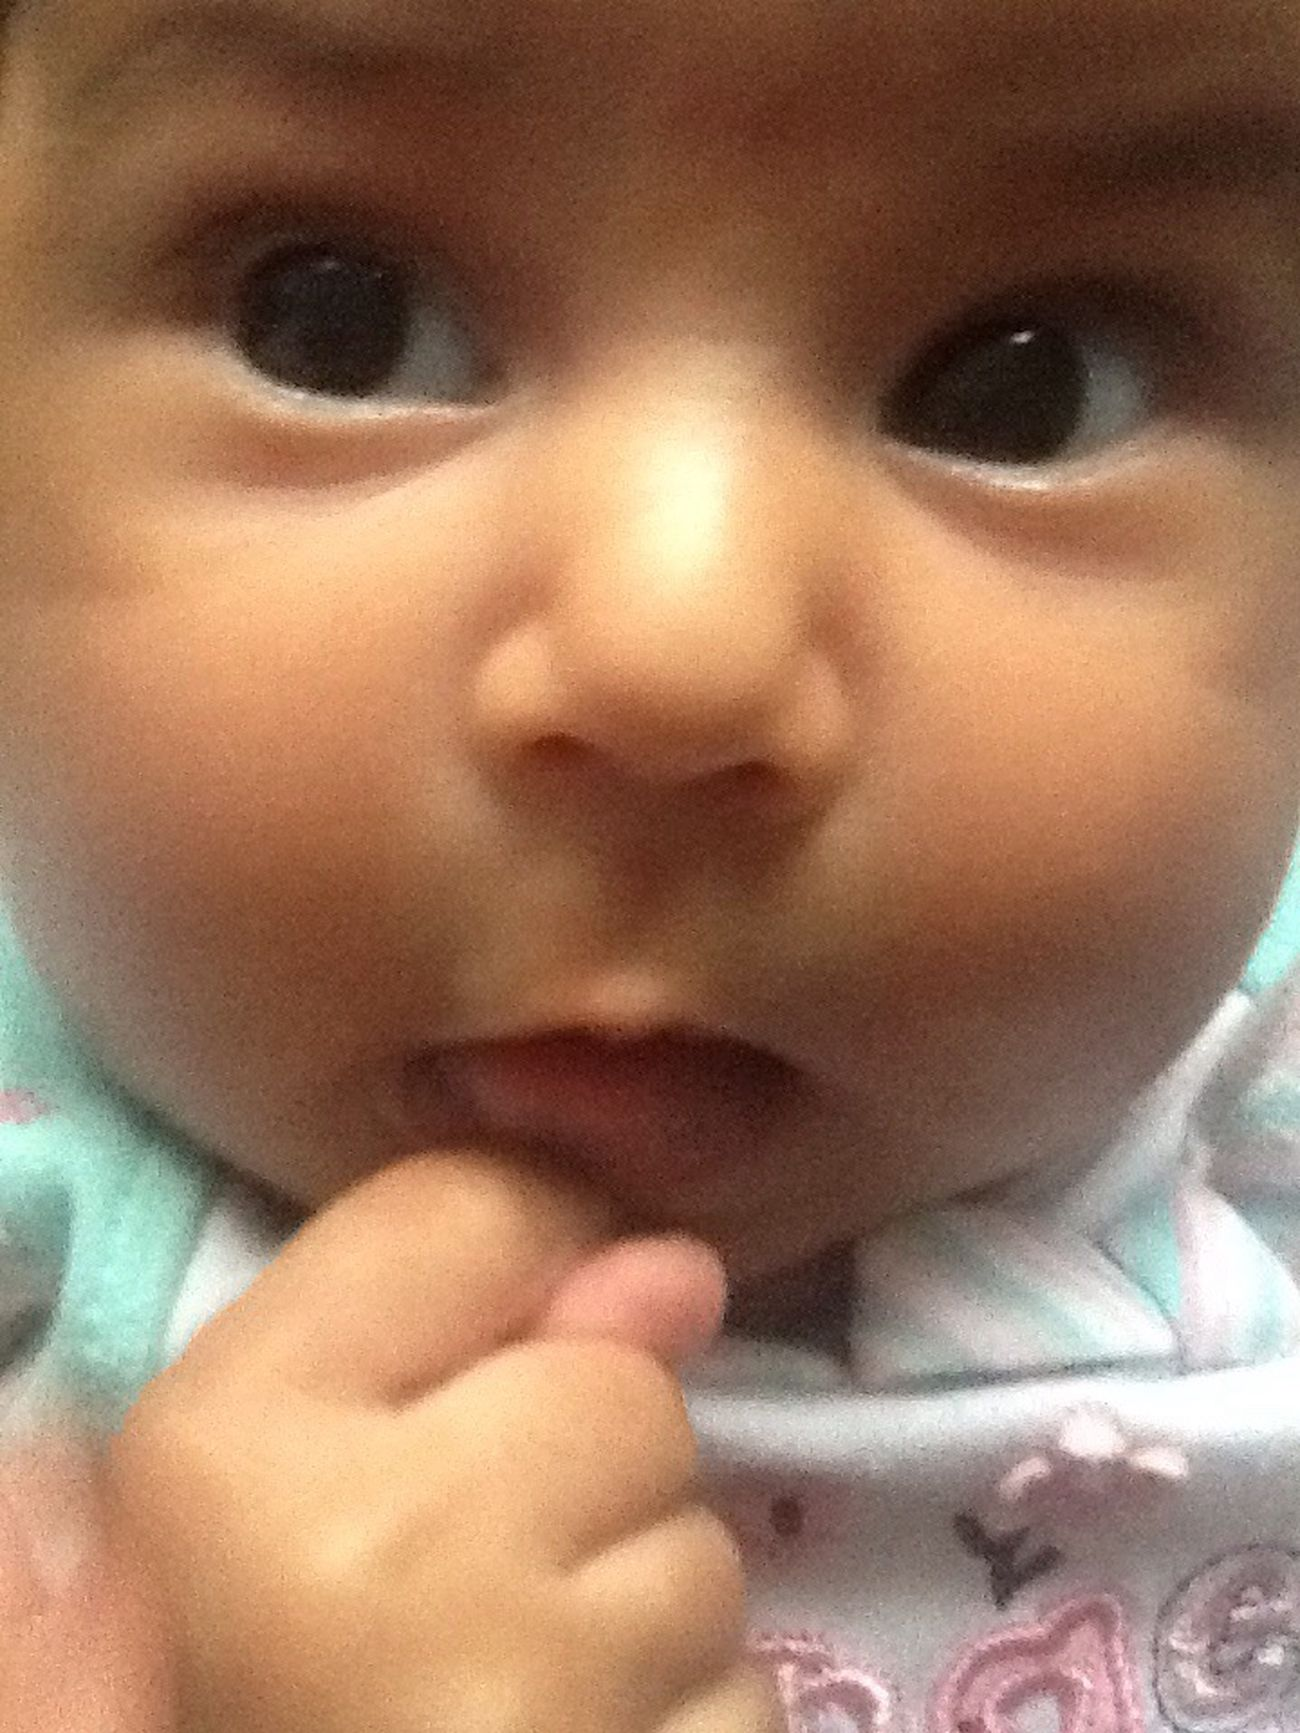 Hermanaaa!!! Innocence Chiquita Little Baby Cute Babies Only Precious Original Unfiltered